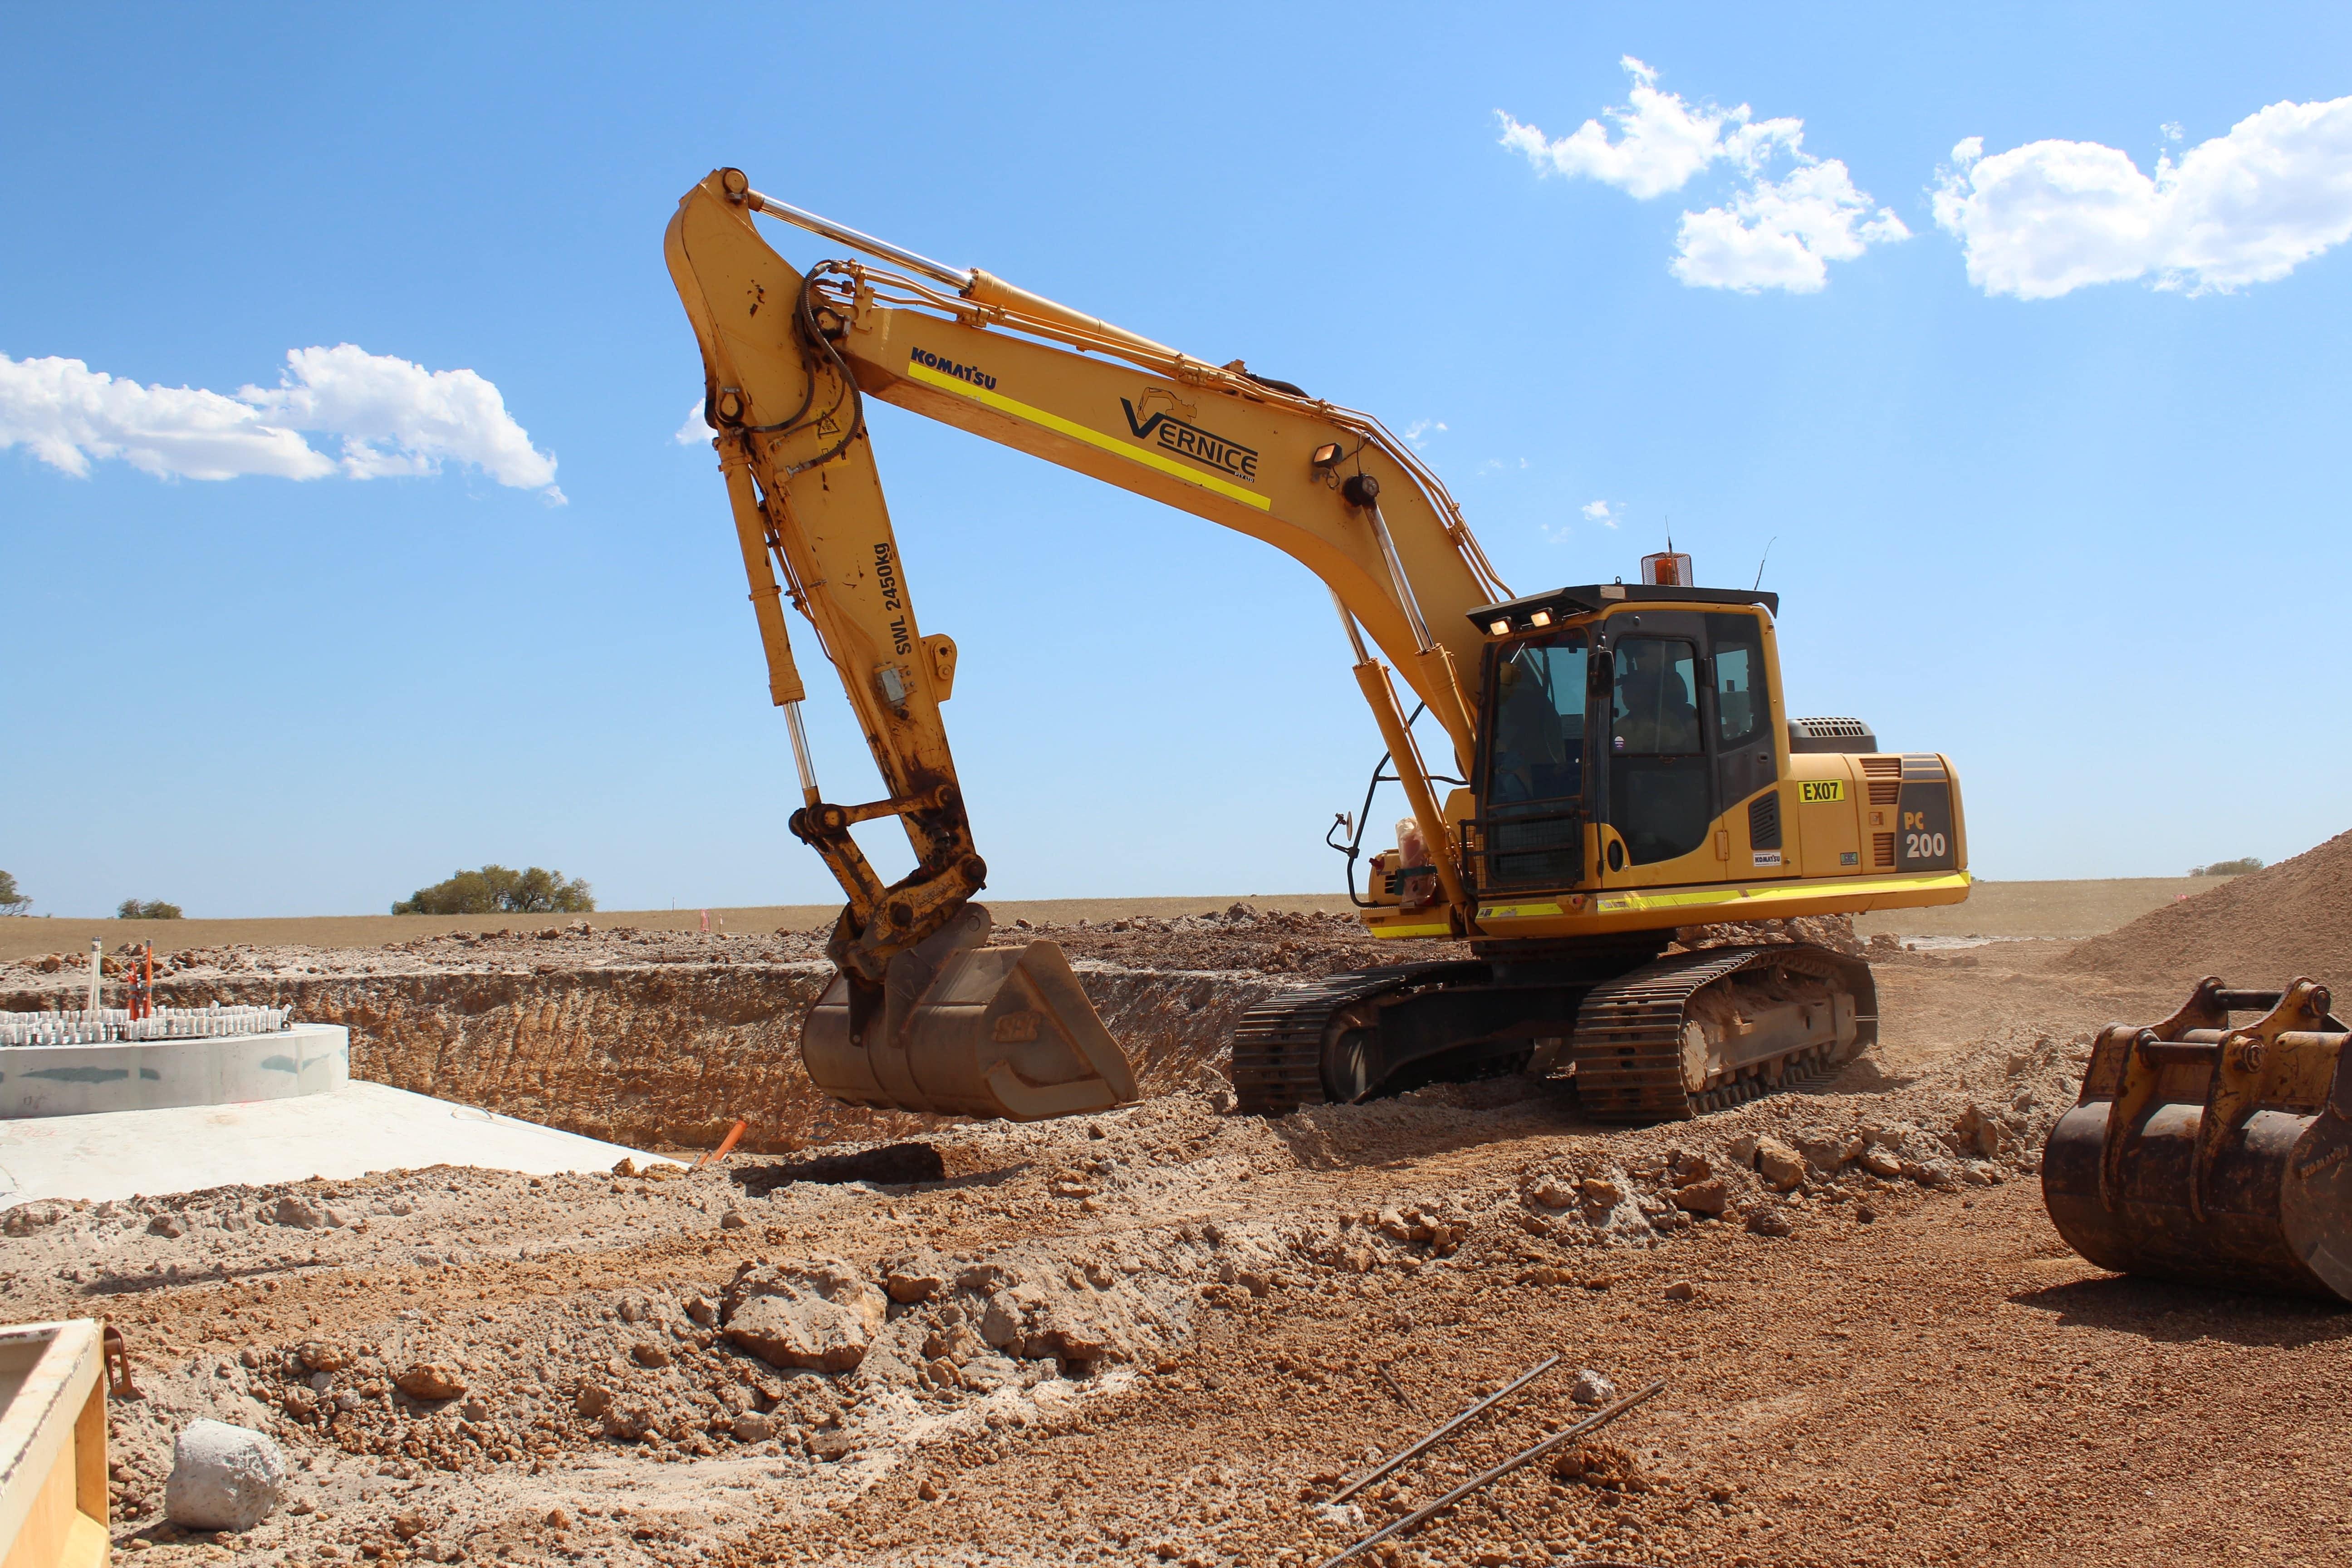 20 t excavator hire vernice western australia